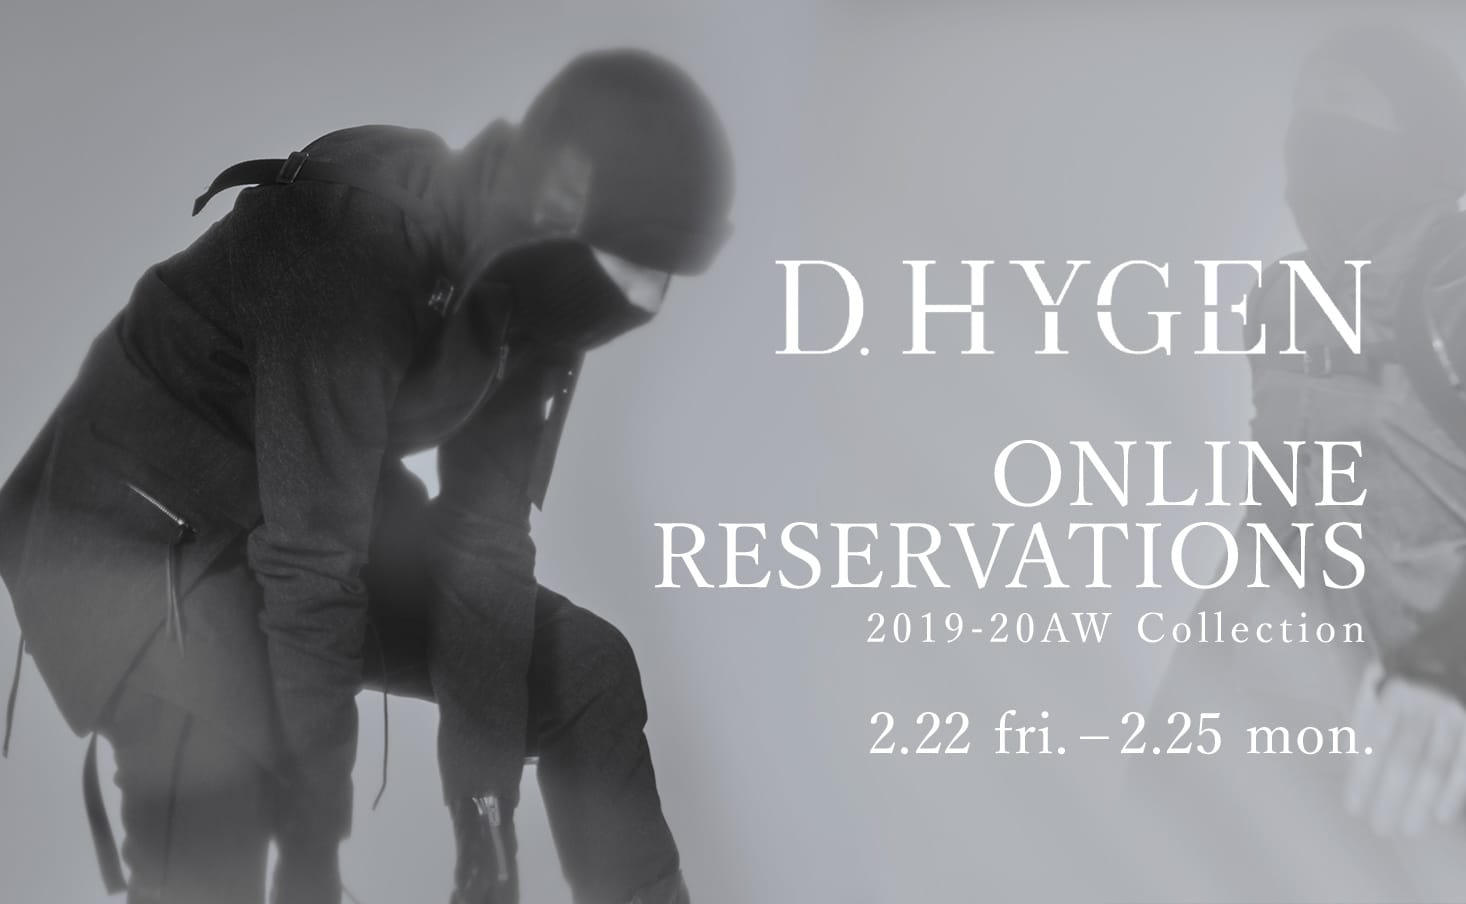 D.hygen 19-20AW Reservation Exhibition